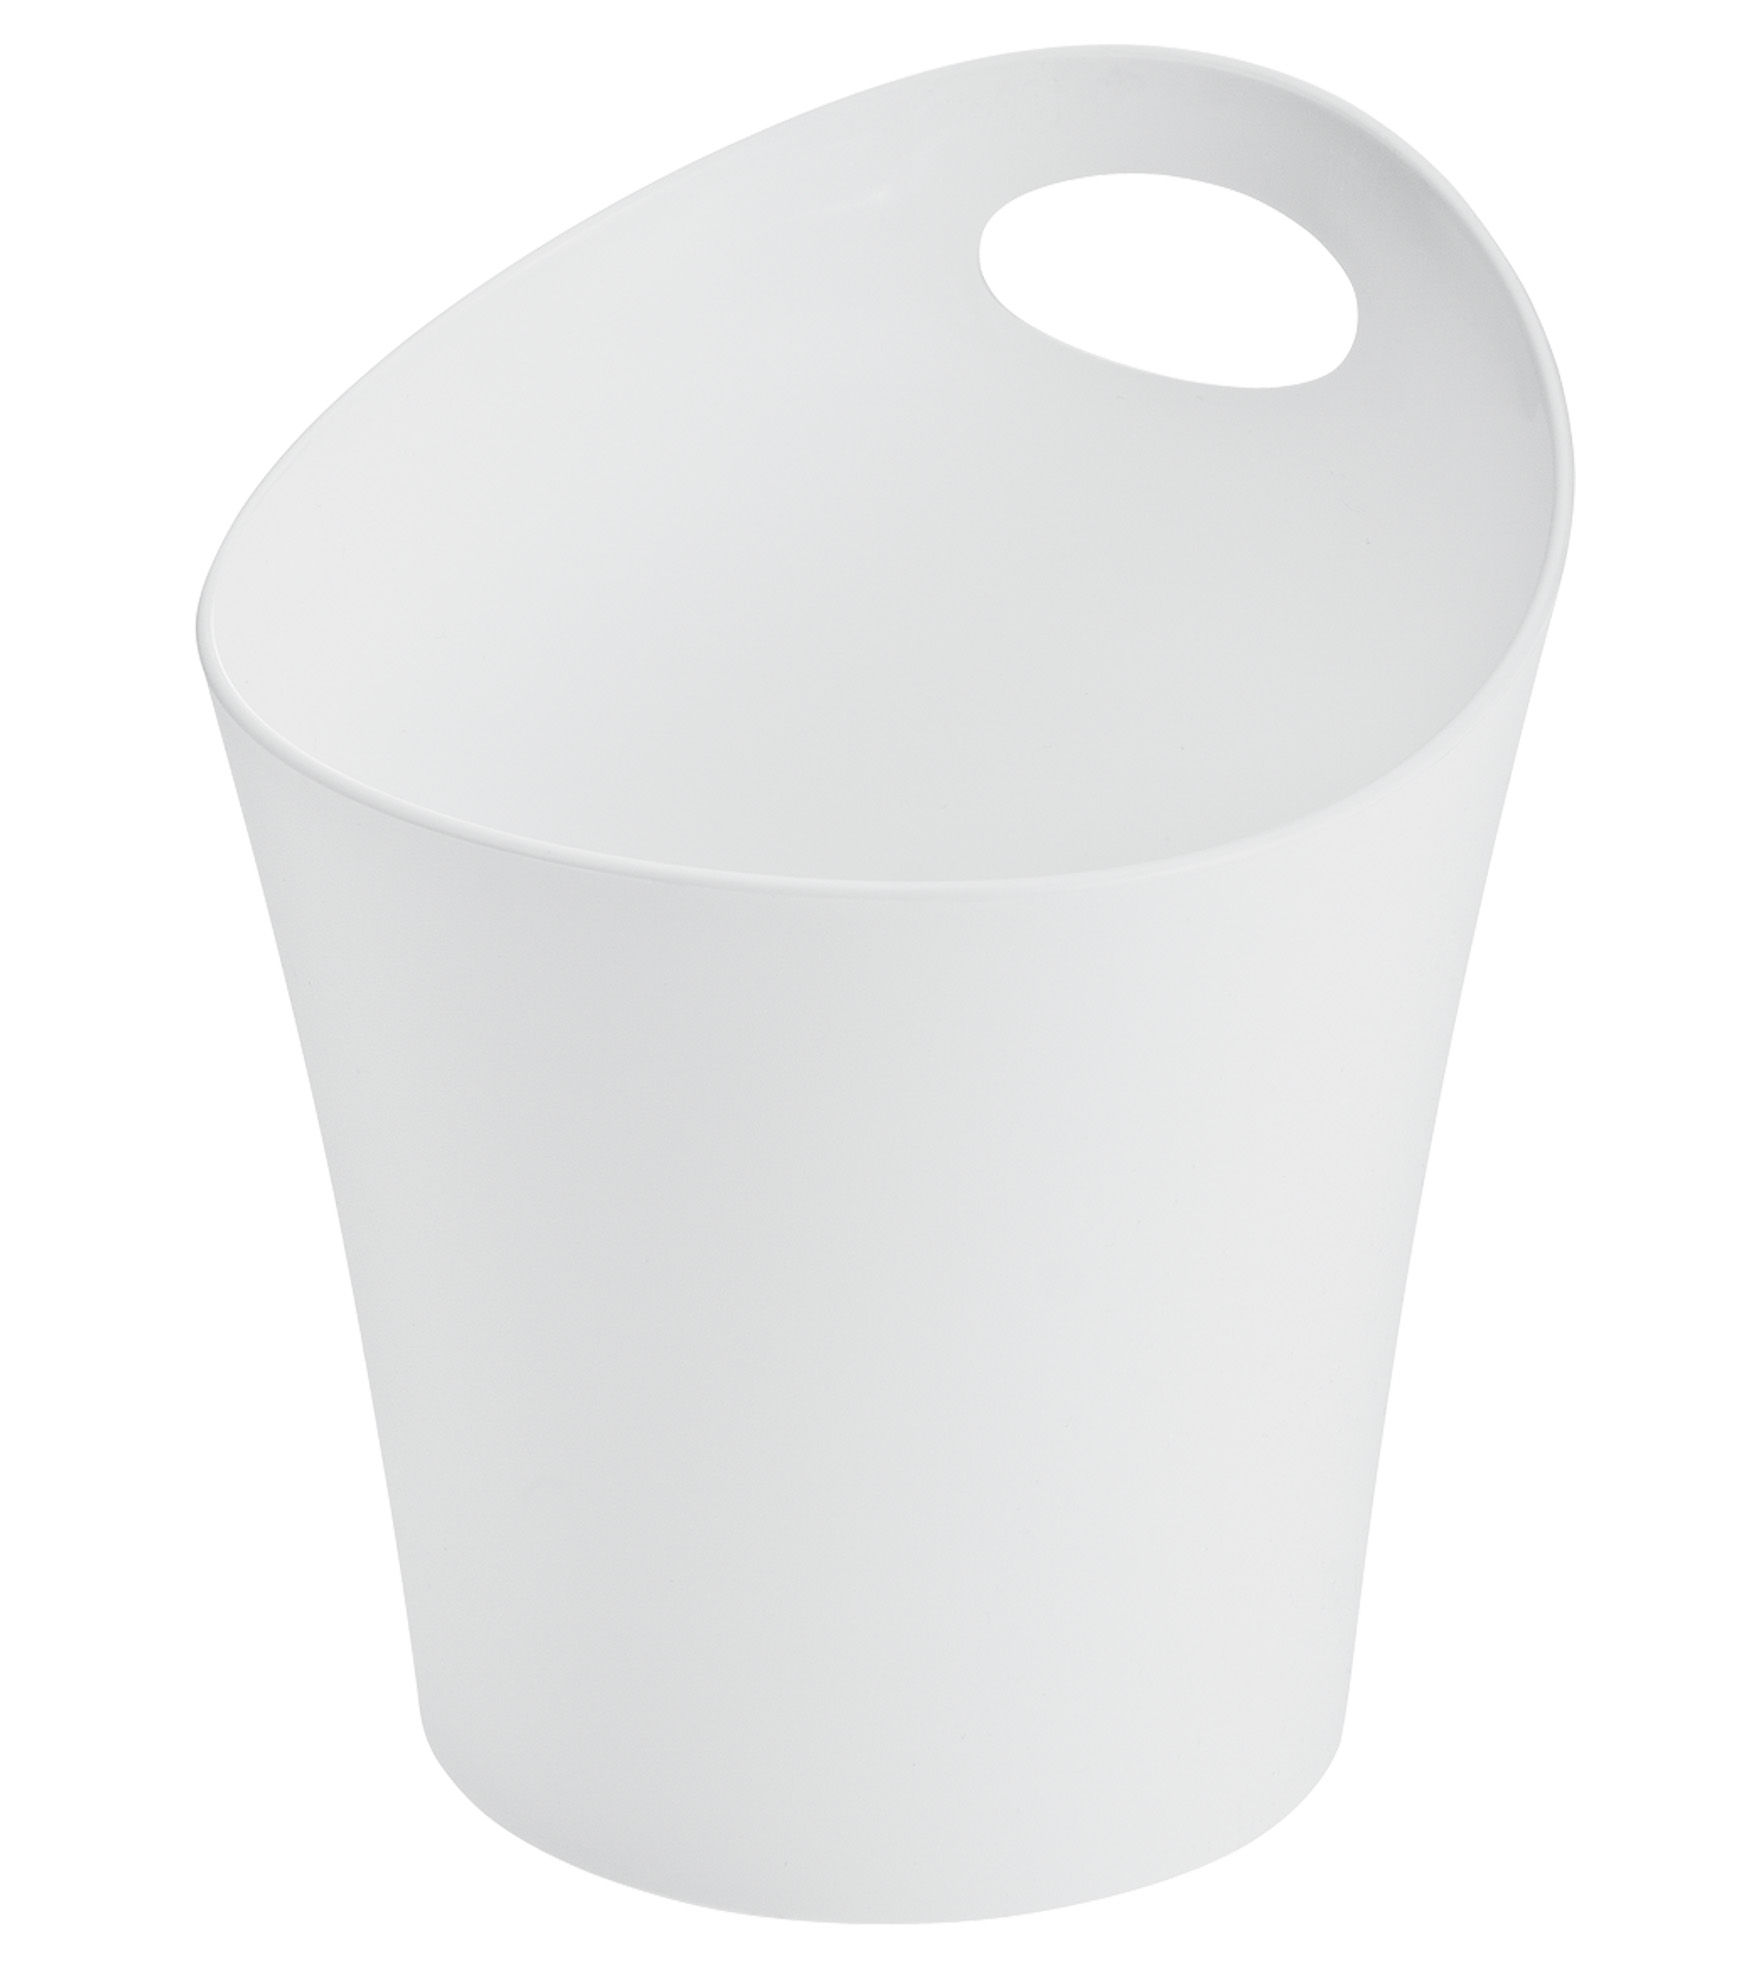 Decoration - For bathroom - Pottichelli L Pot - Pot by Koziol - White - PMMA